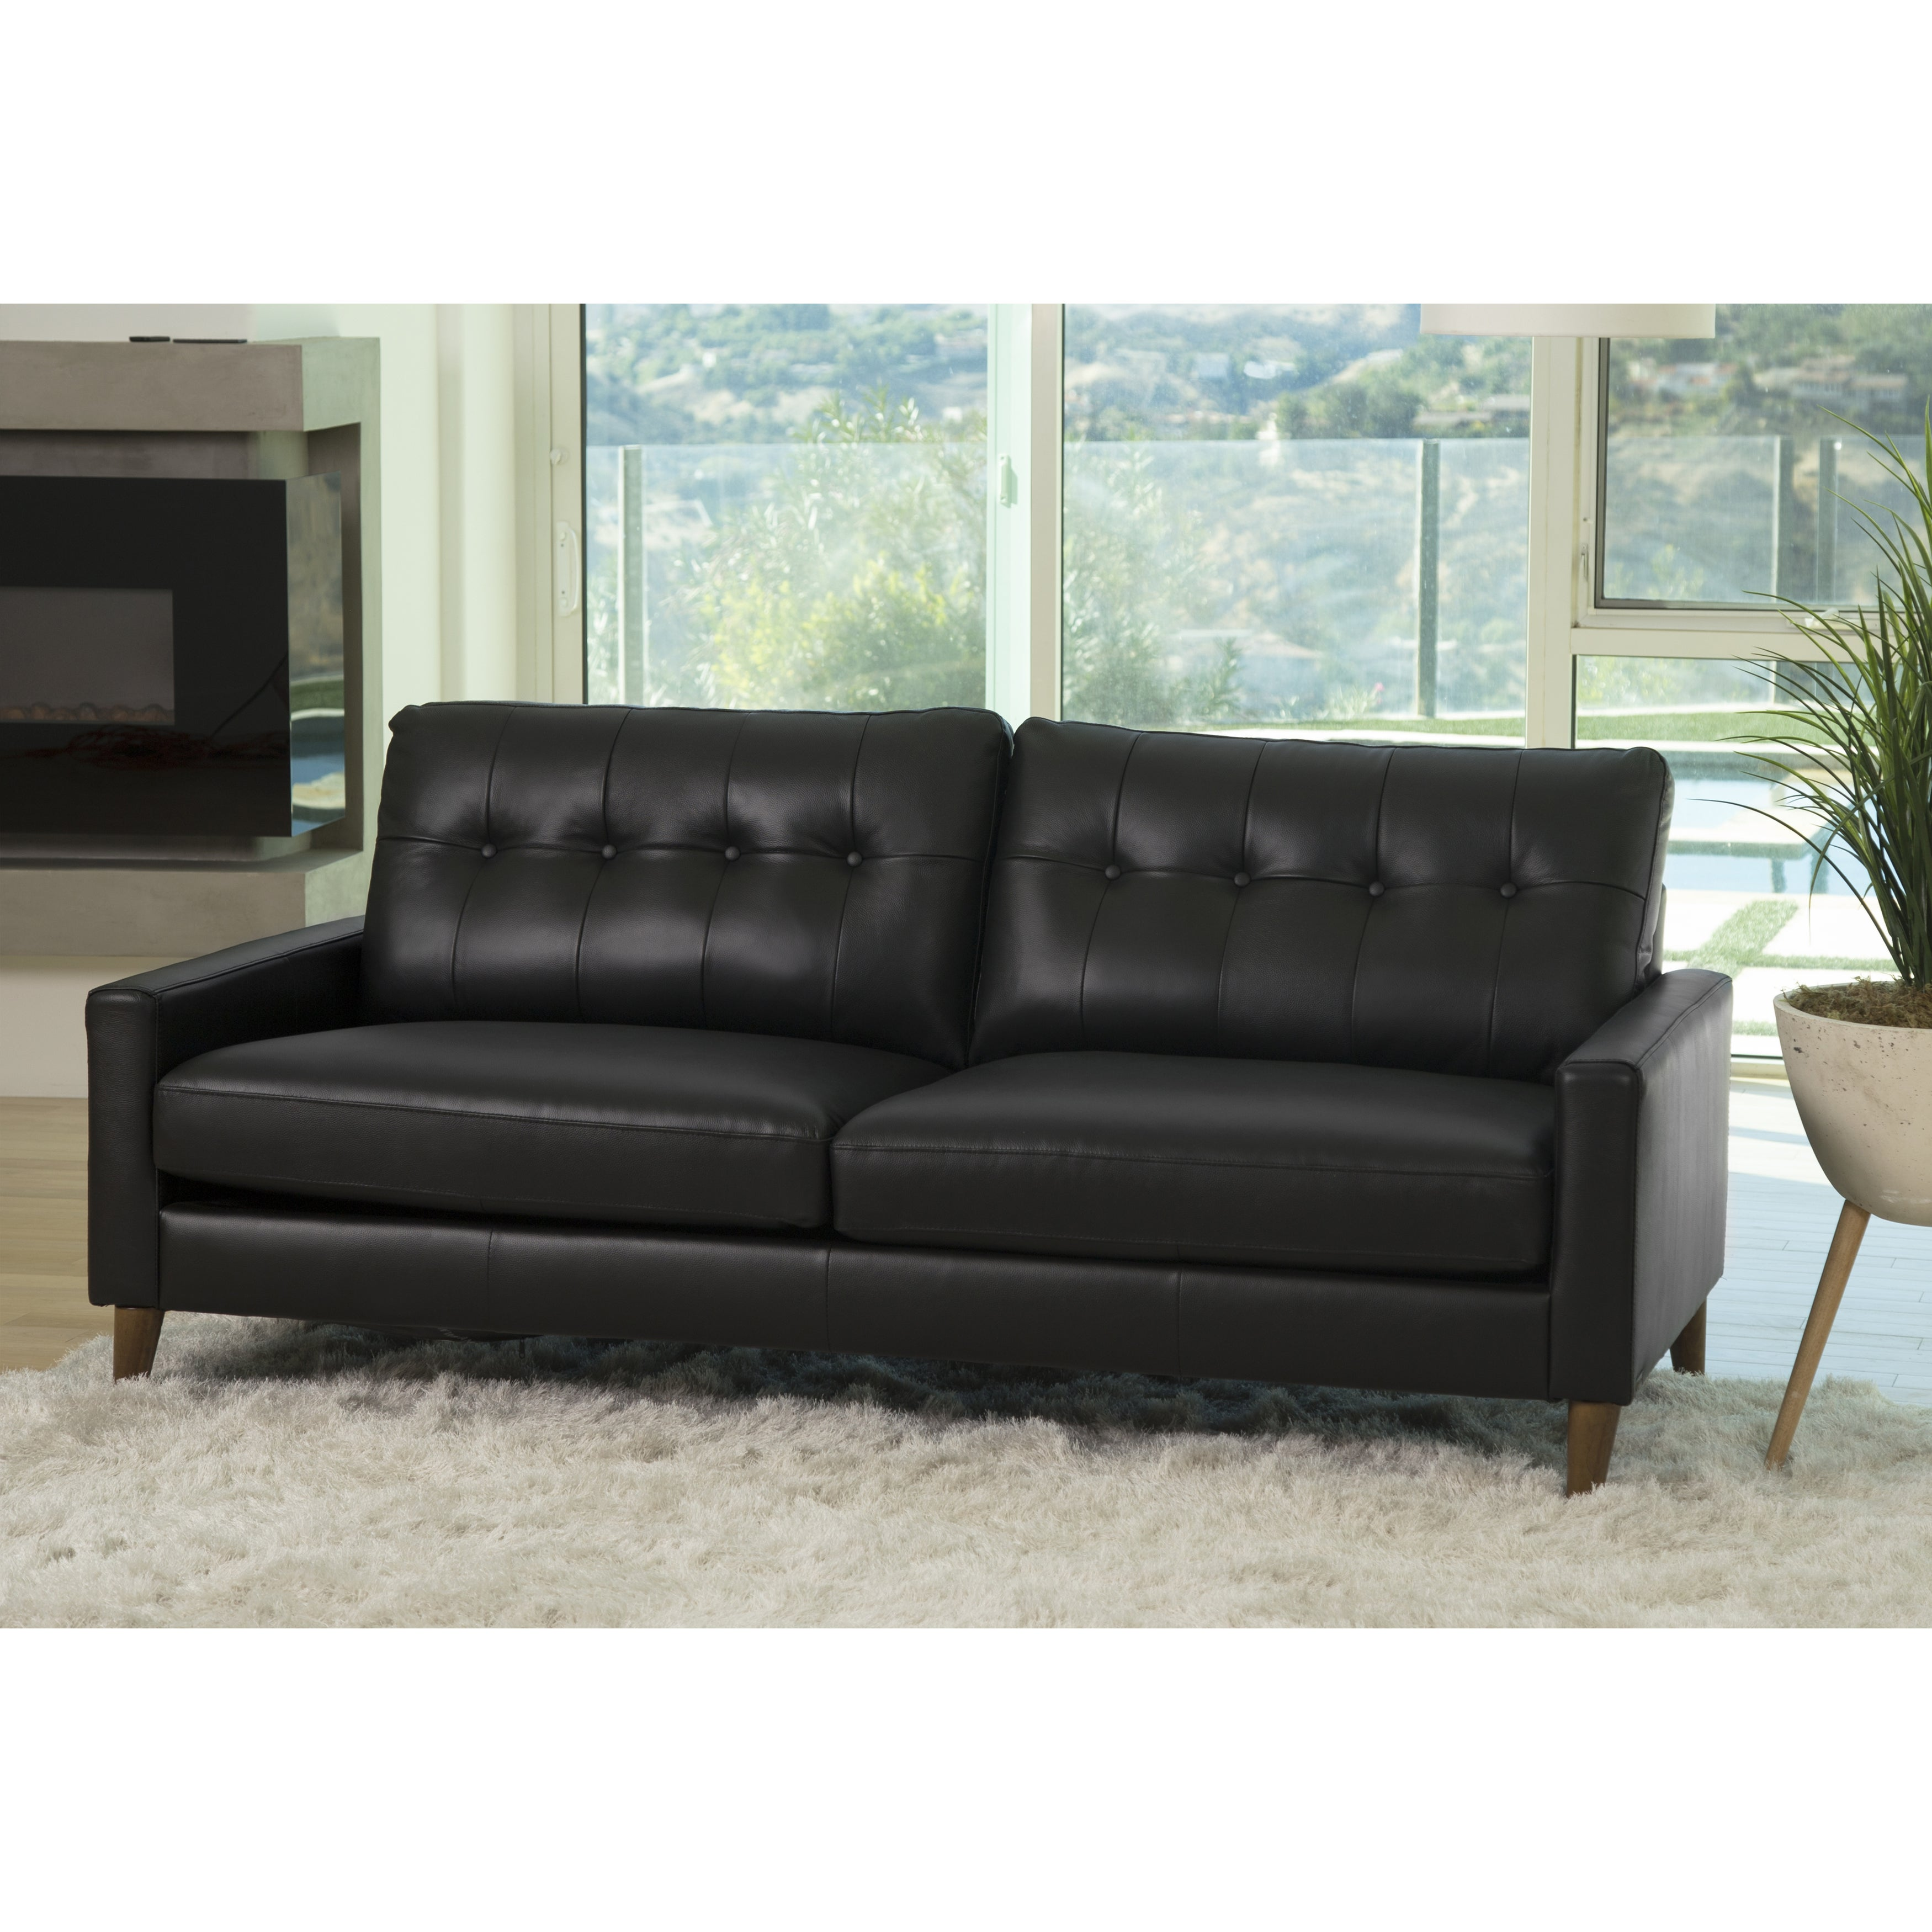 Abbyson Wright Mid Century Top Grain Leather Sofa Ebay